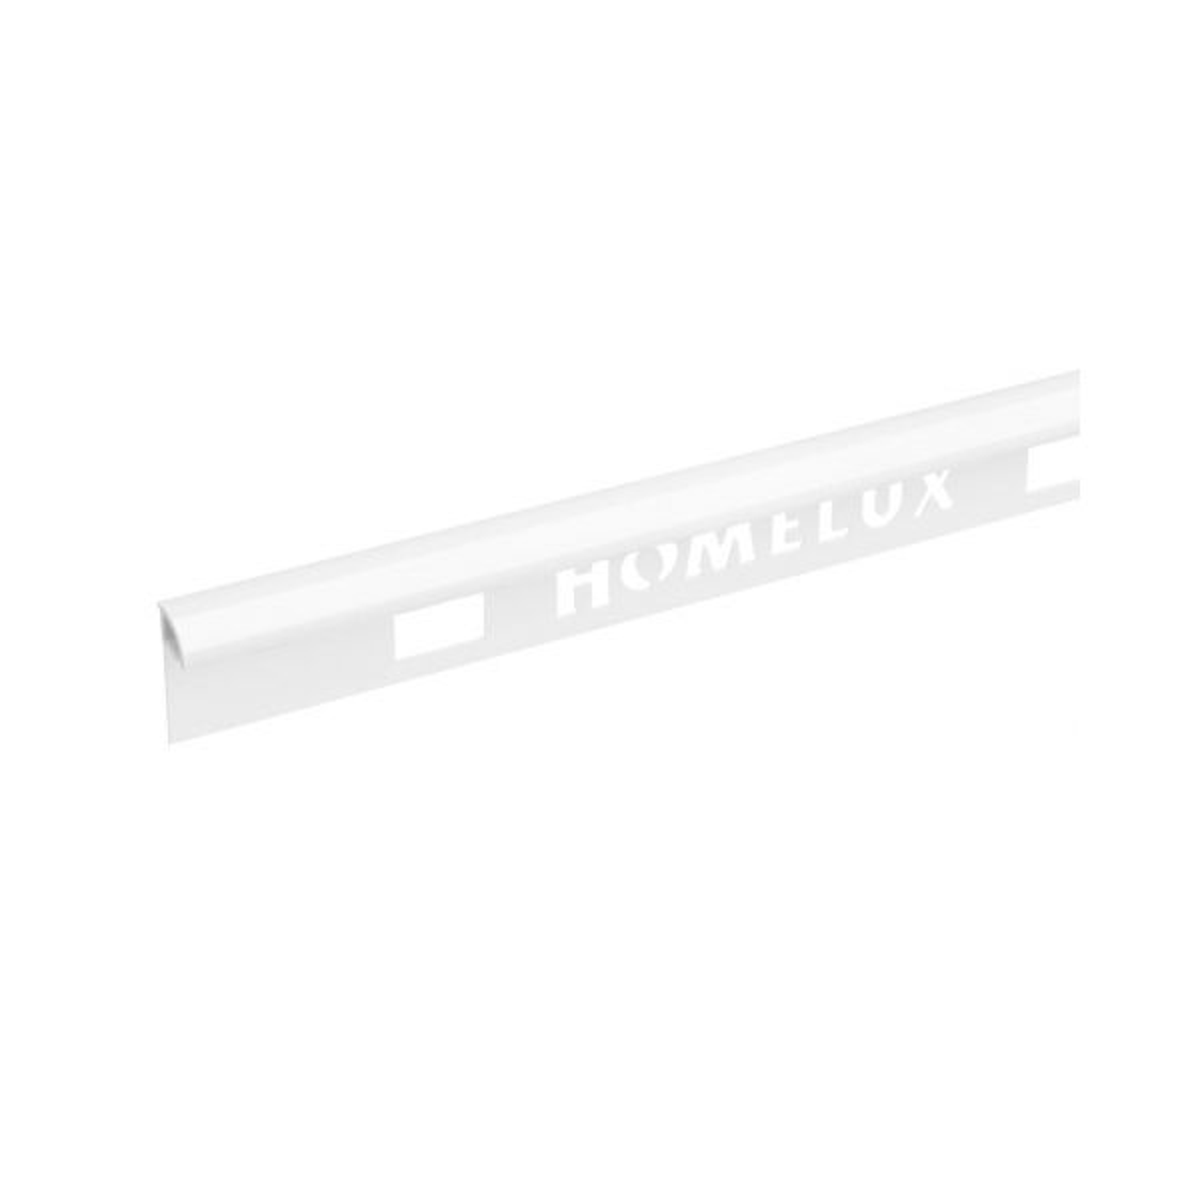 Homelux PVC Quadrant Edge 6mm Gloss White Tile Trim 2.44m